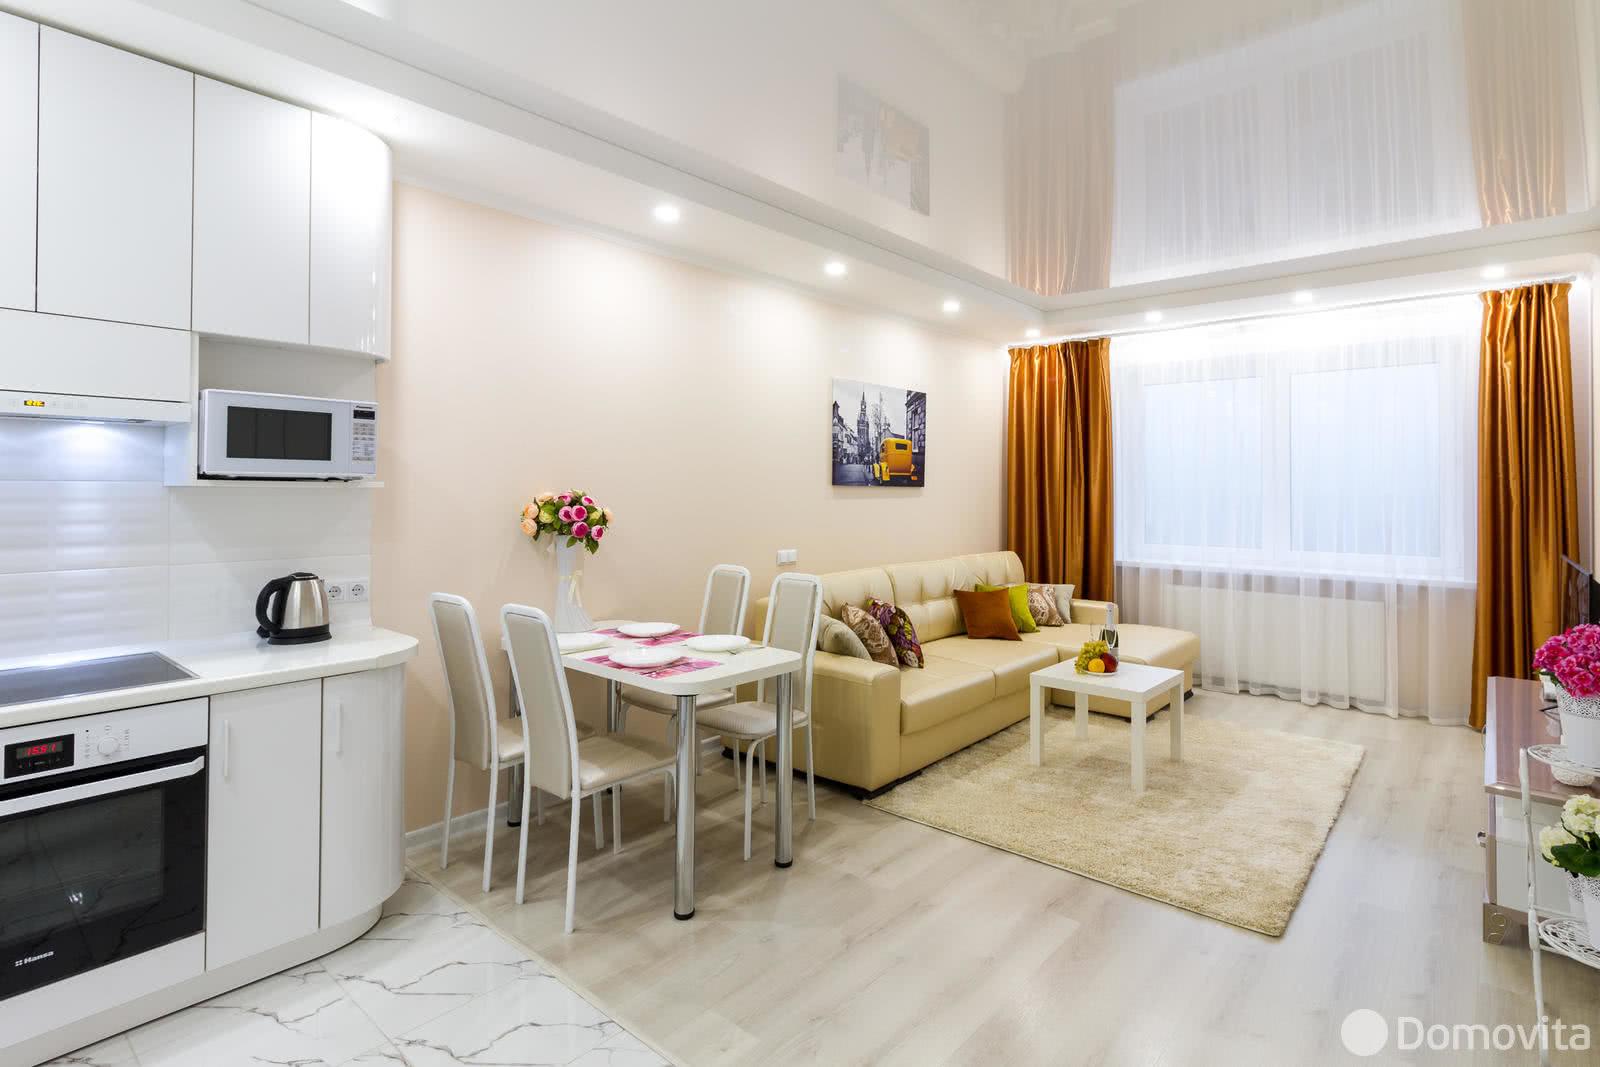 Аренда 2-комнатной квартиры на сутки в Минске, ул. Репина, д. 4 - фото 6